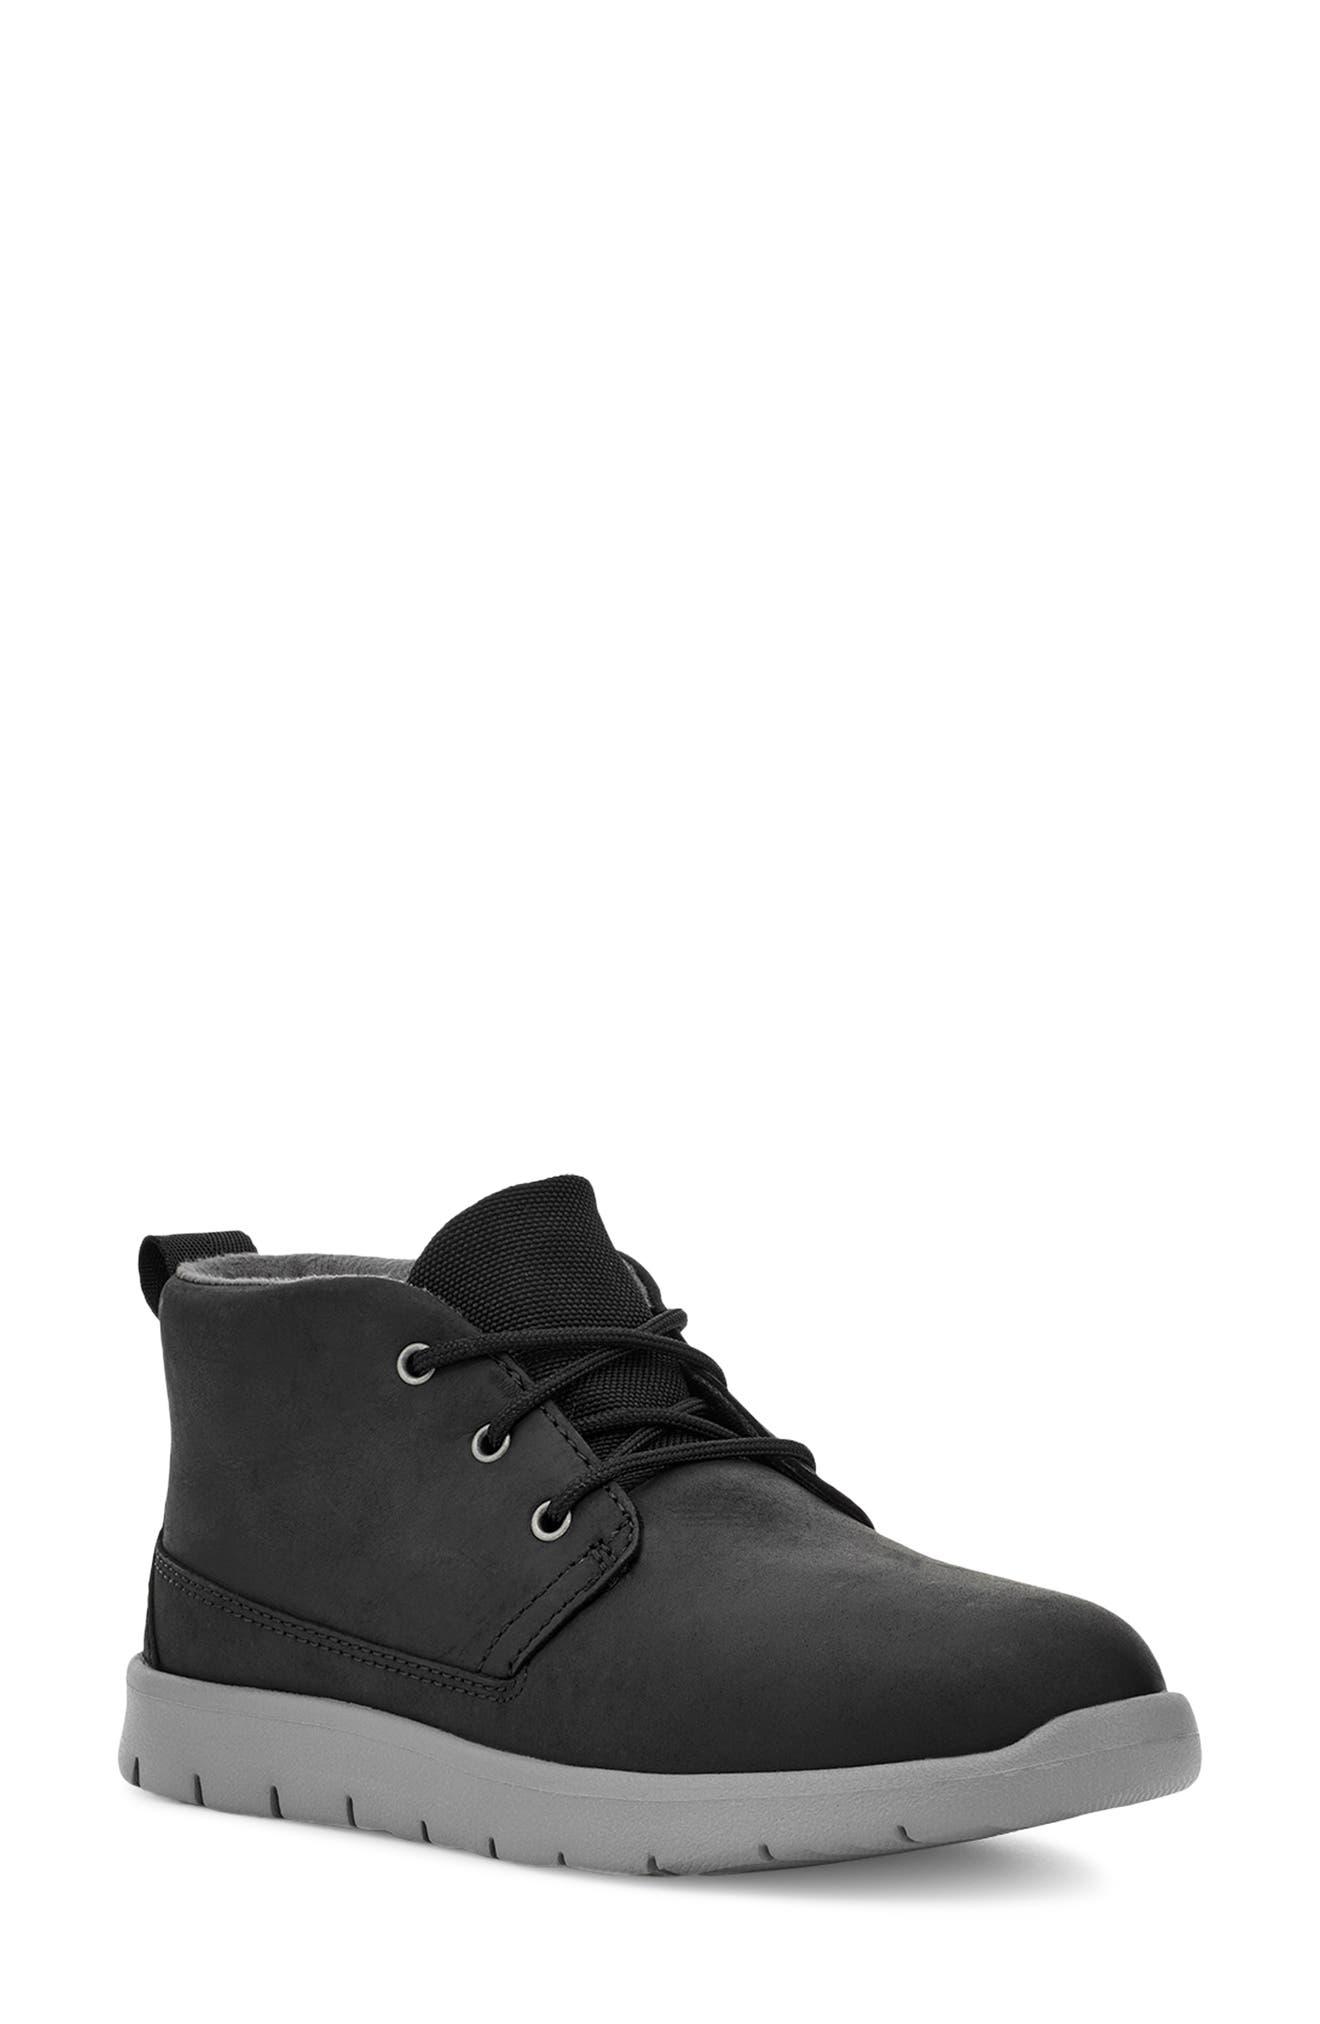 Boys' UGG® Shoes